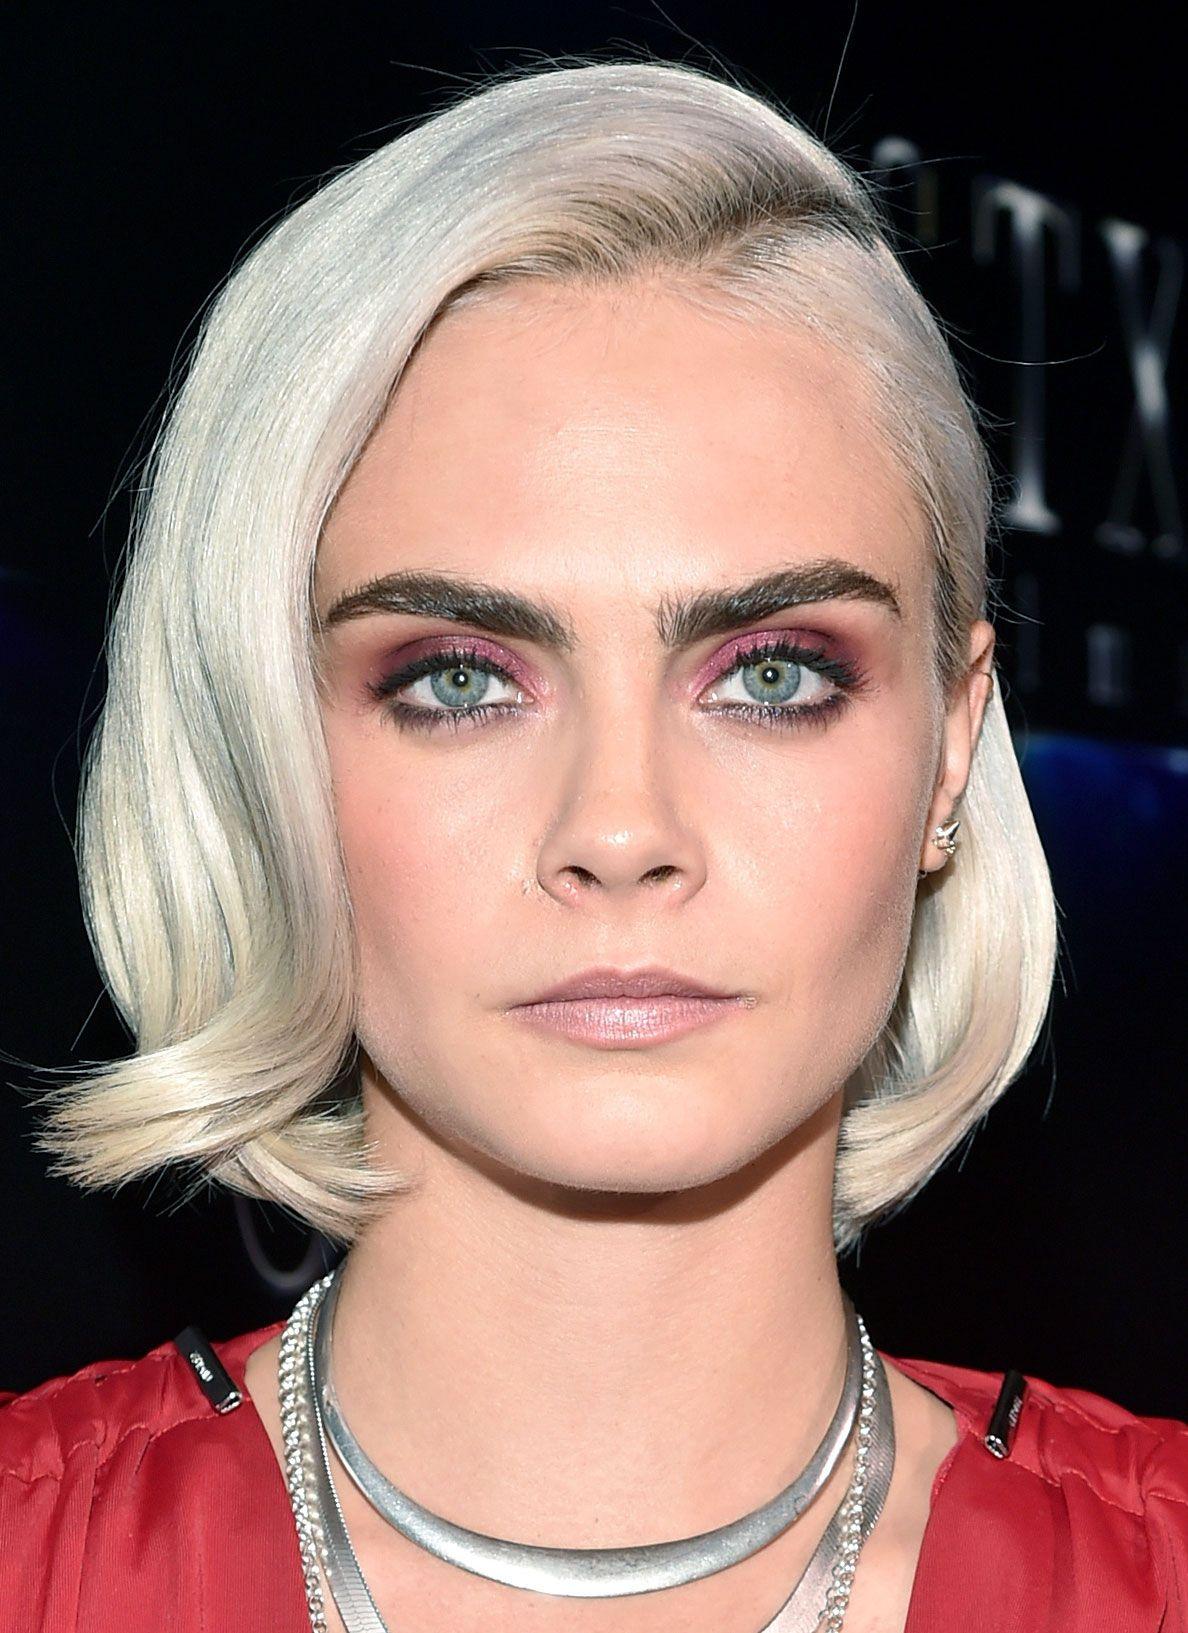 Spaatspringridge Medspa Wyomissing Microblading Eyebrows Celebs Caradelevingne Call For More Info 610 880 8265 And Click T Svetlyj Bob Strizhka Pricheski